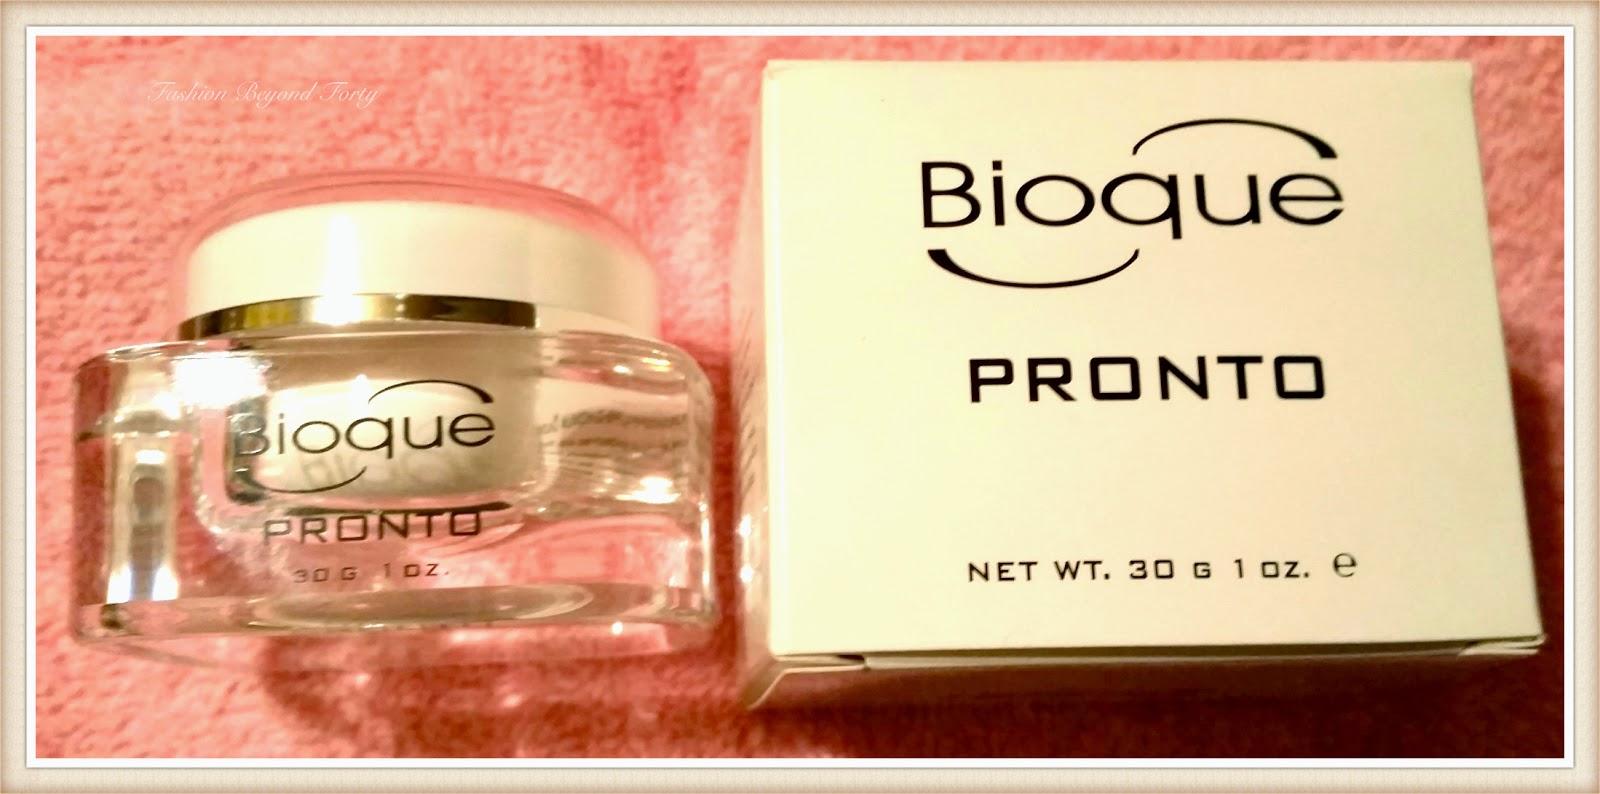 Bioque Pronto Instant Wrinkle Visibility Zapper